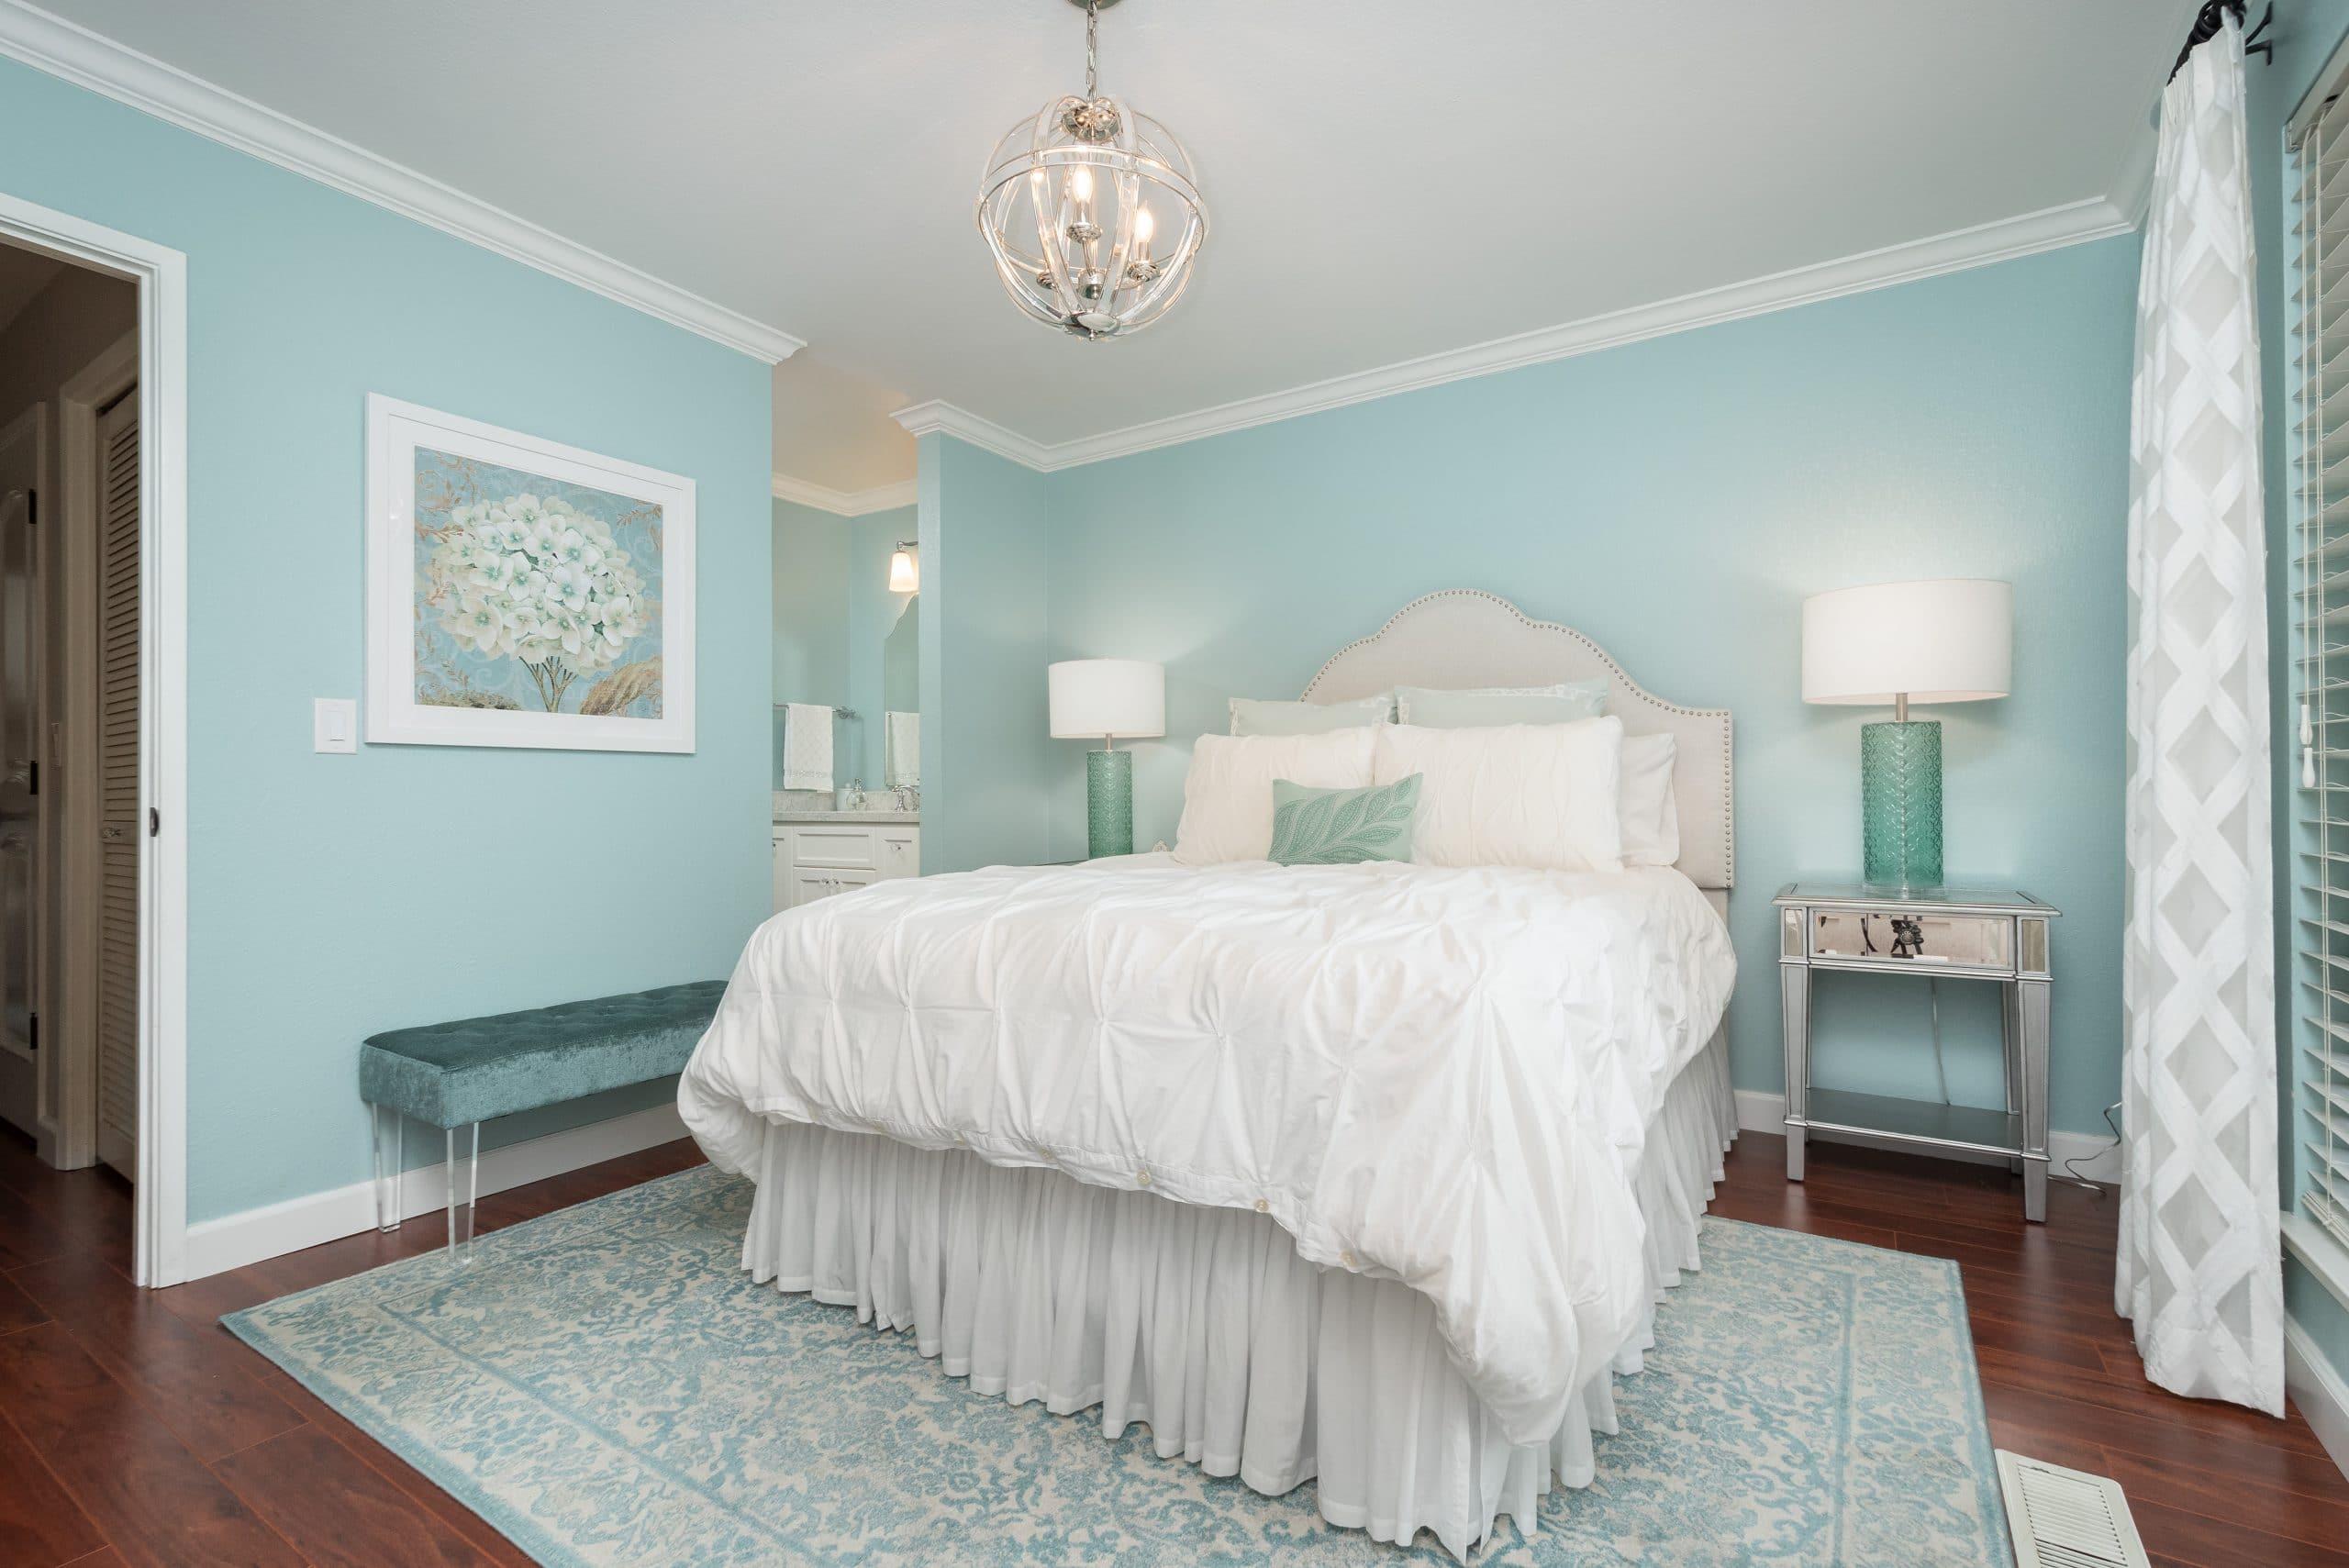 Master Bedroom and Bath Transformation